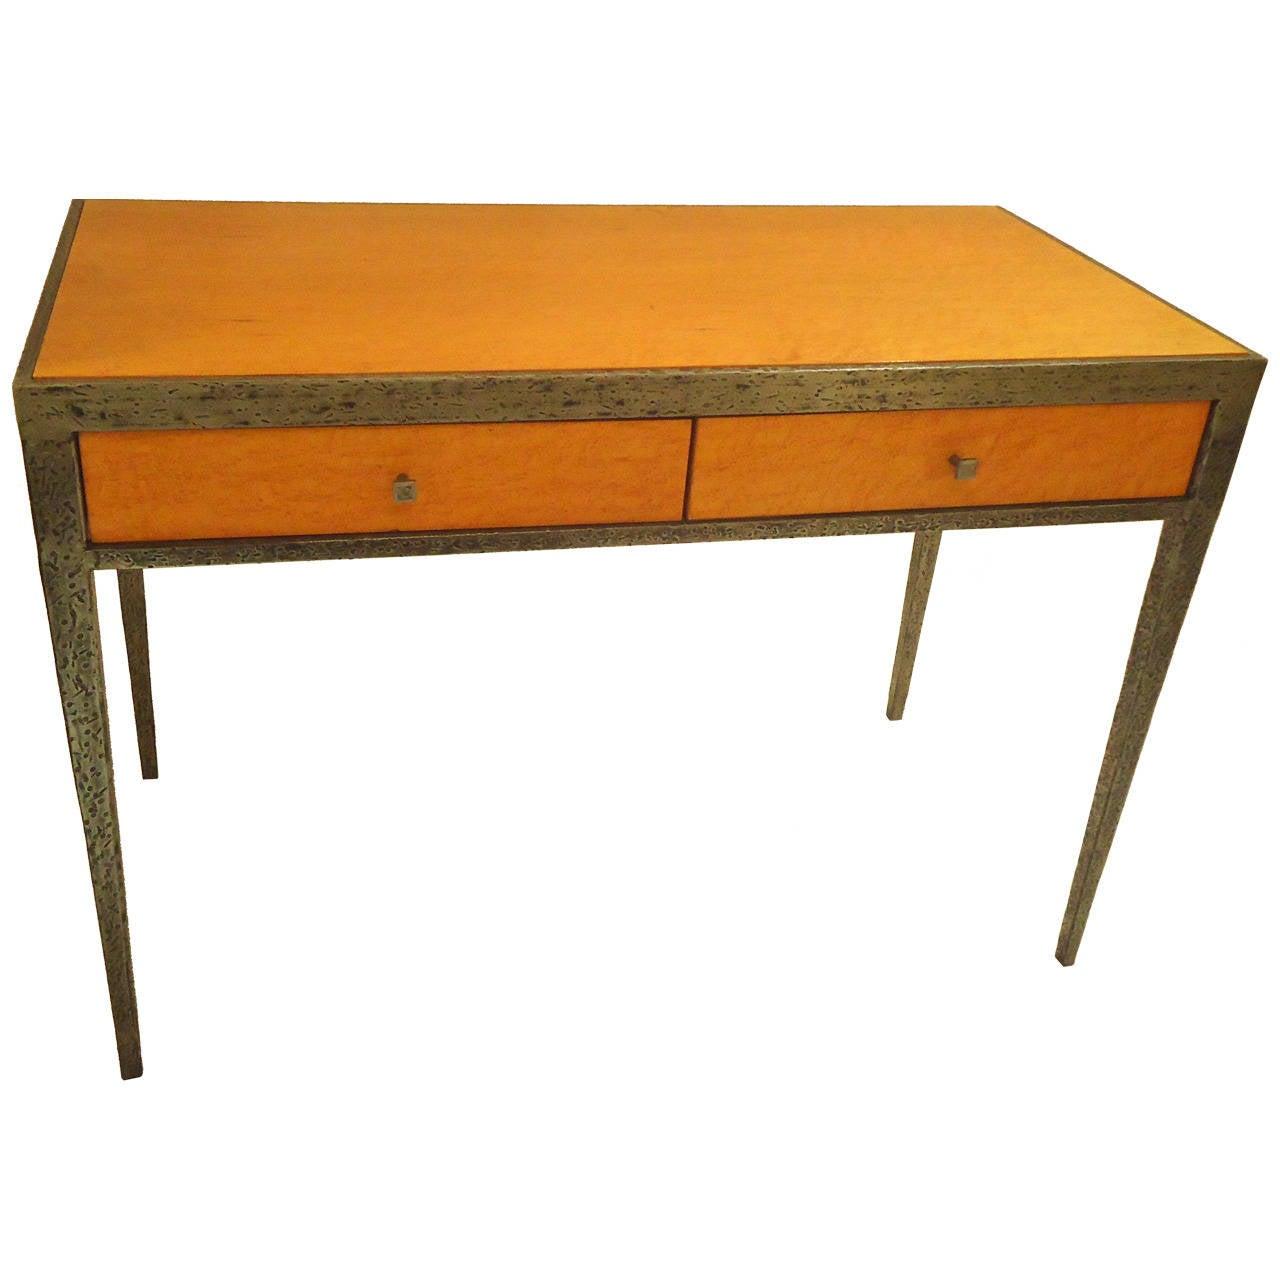 writing desk modern Writing desk modern giorgetti ion writing desk modern desks and hutches, mid century modern writing desk at 1stdibs.